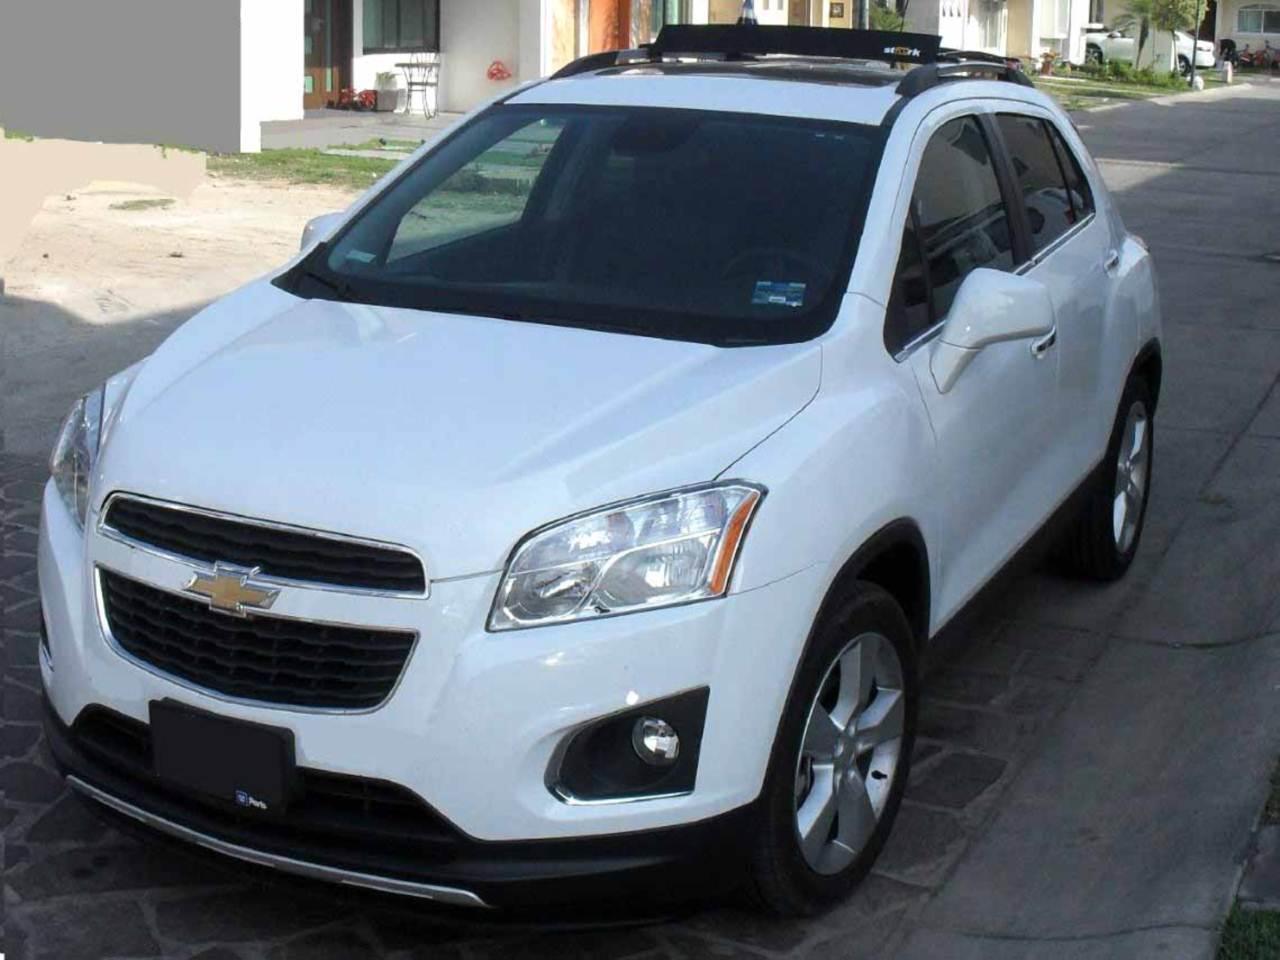 Chevrolet Tracker 2014 foto - 2